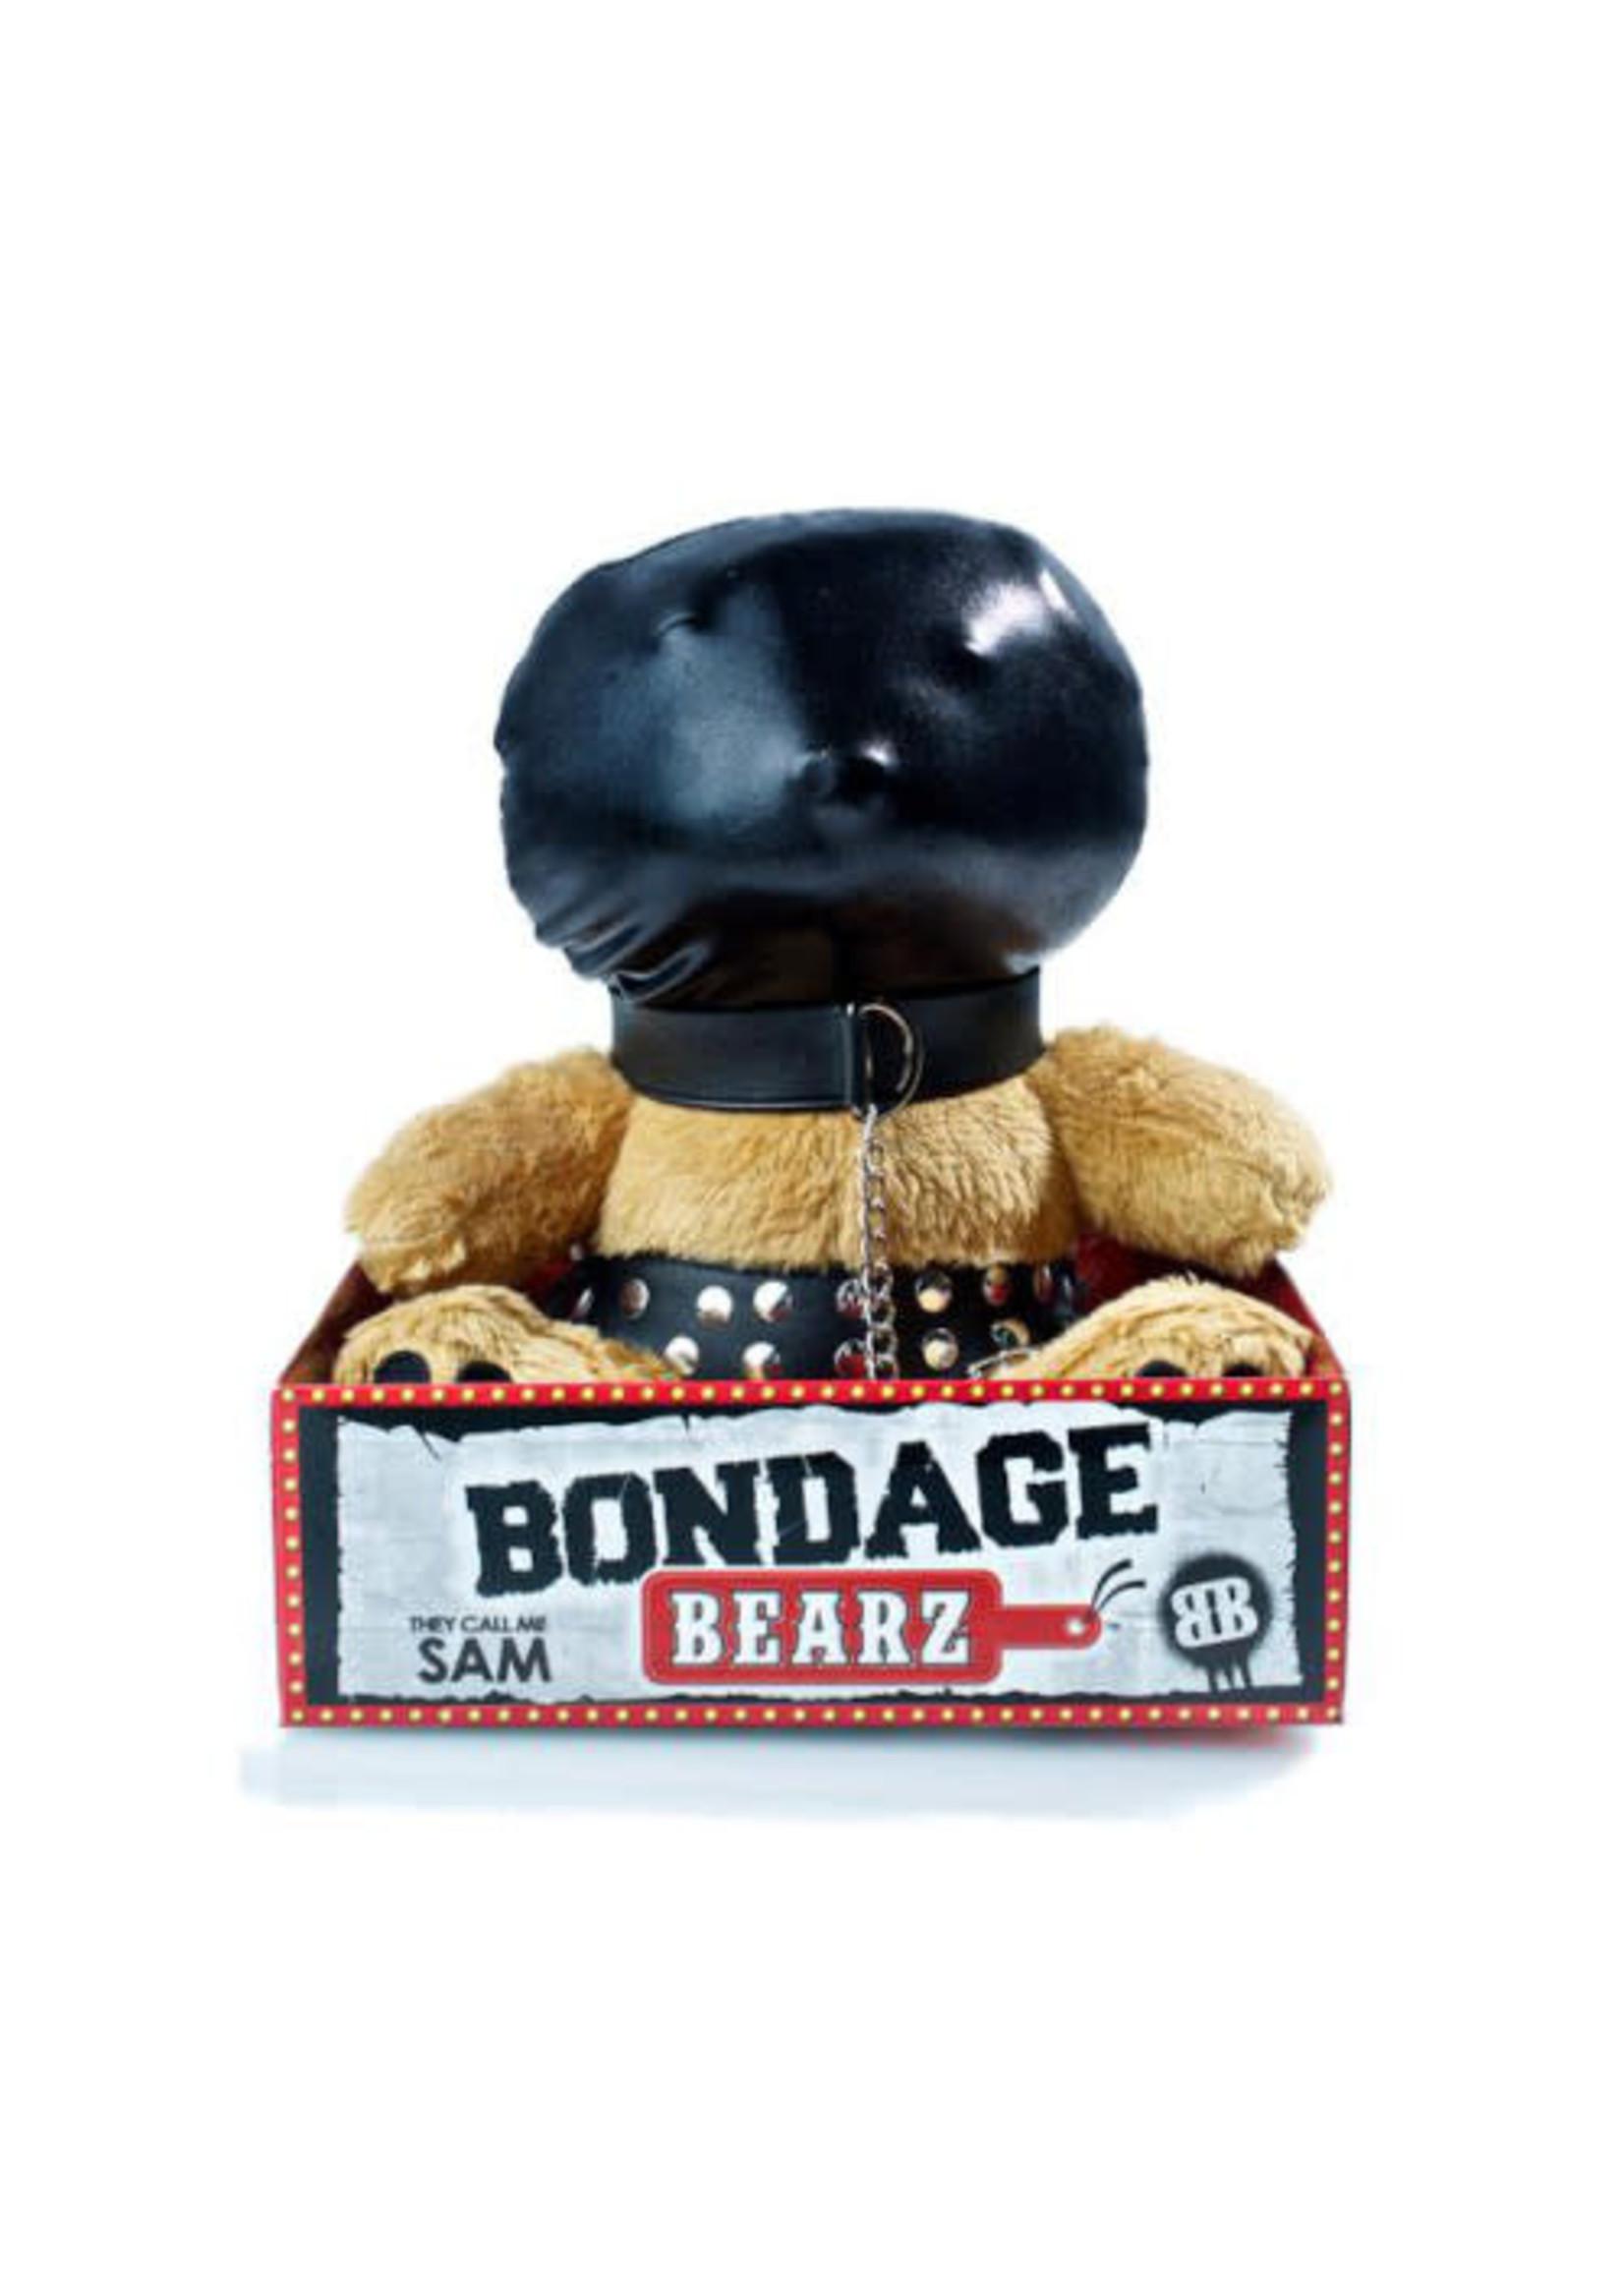 Bondage Bearz